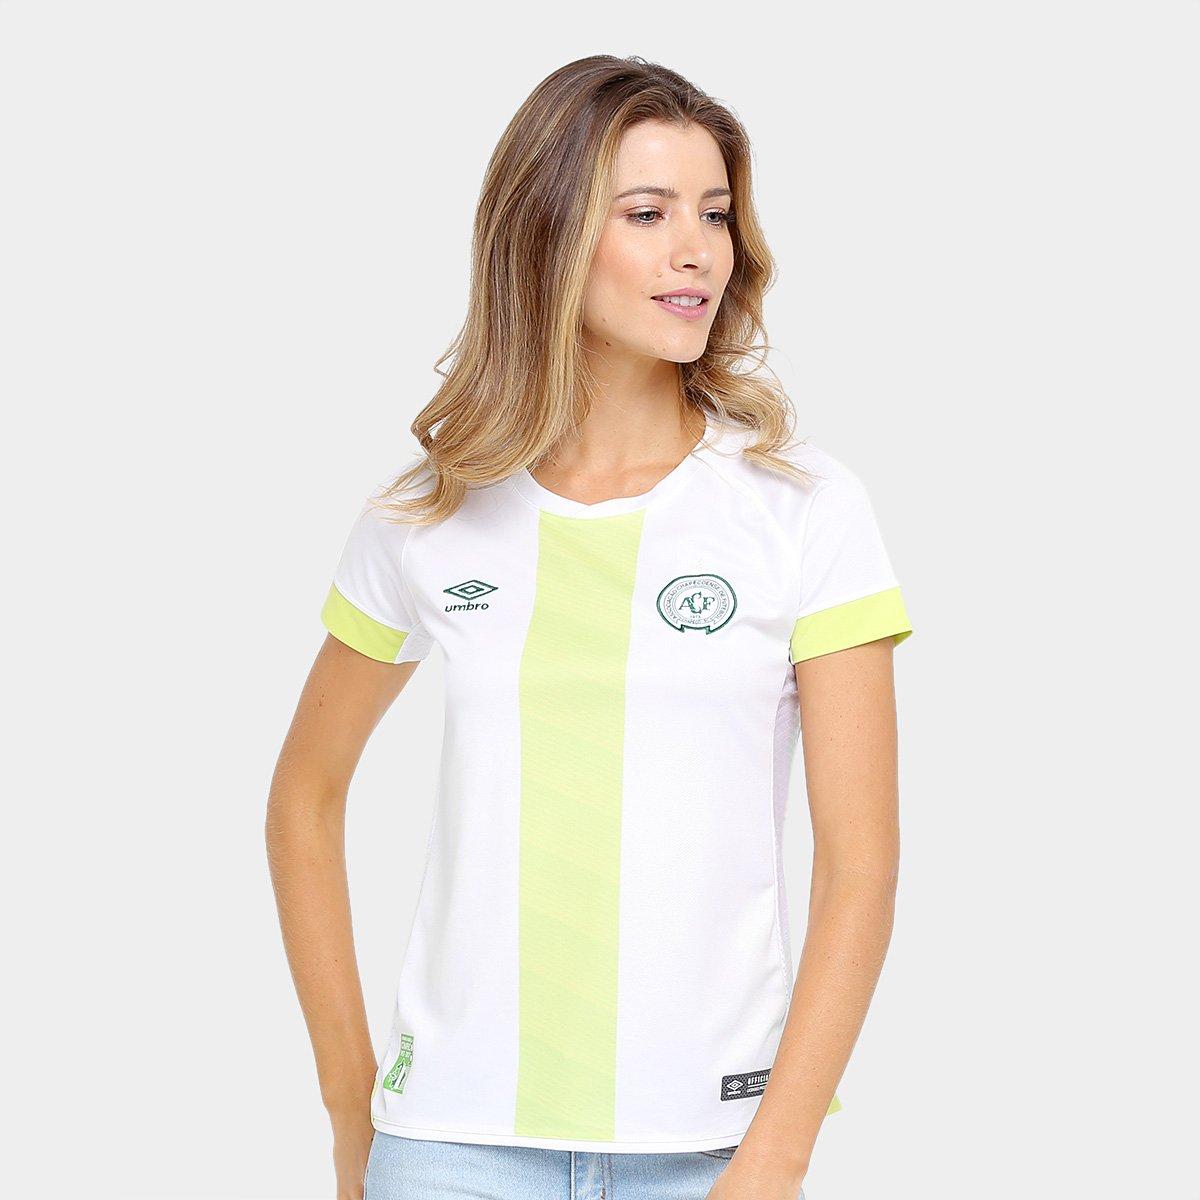 Camisa Chapecoense II 17 18 s nº - Torcedor Umbro Feminina 6a5c3e945b9fd